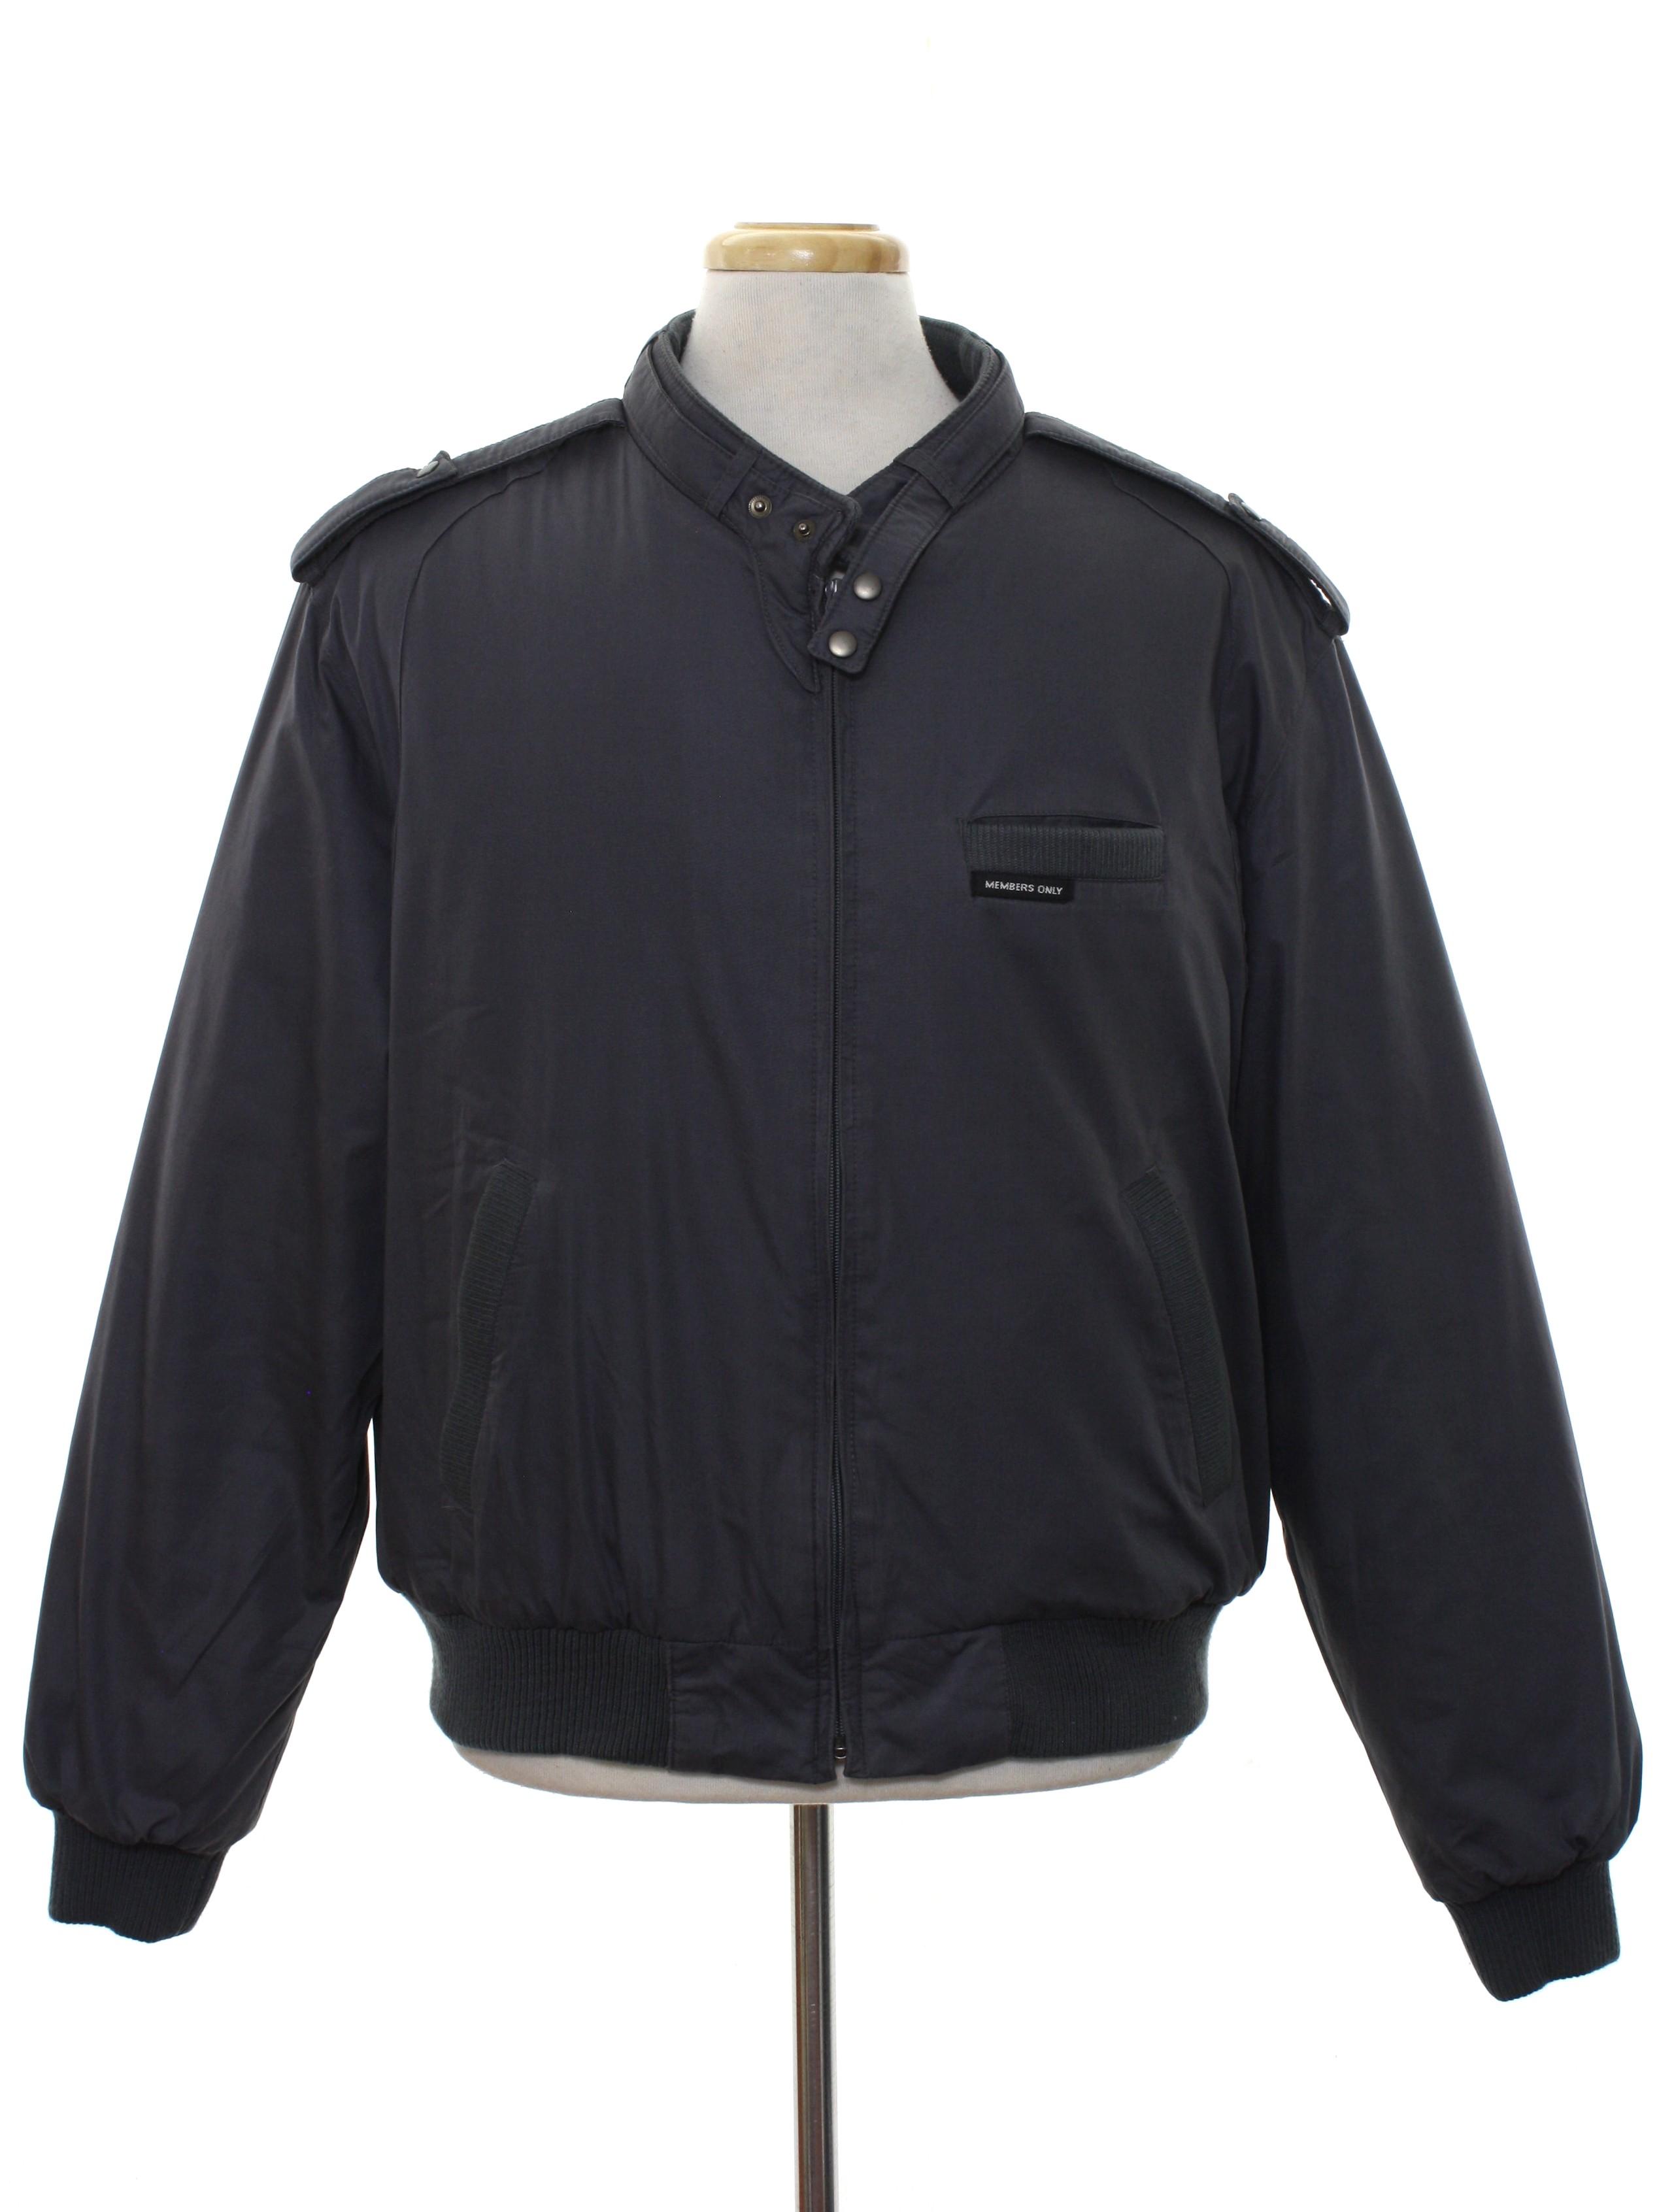 1980's Members Only Jacket mNpLbk